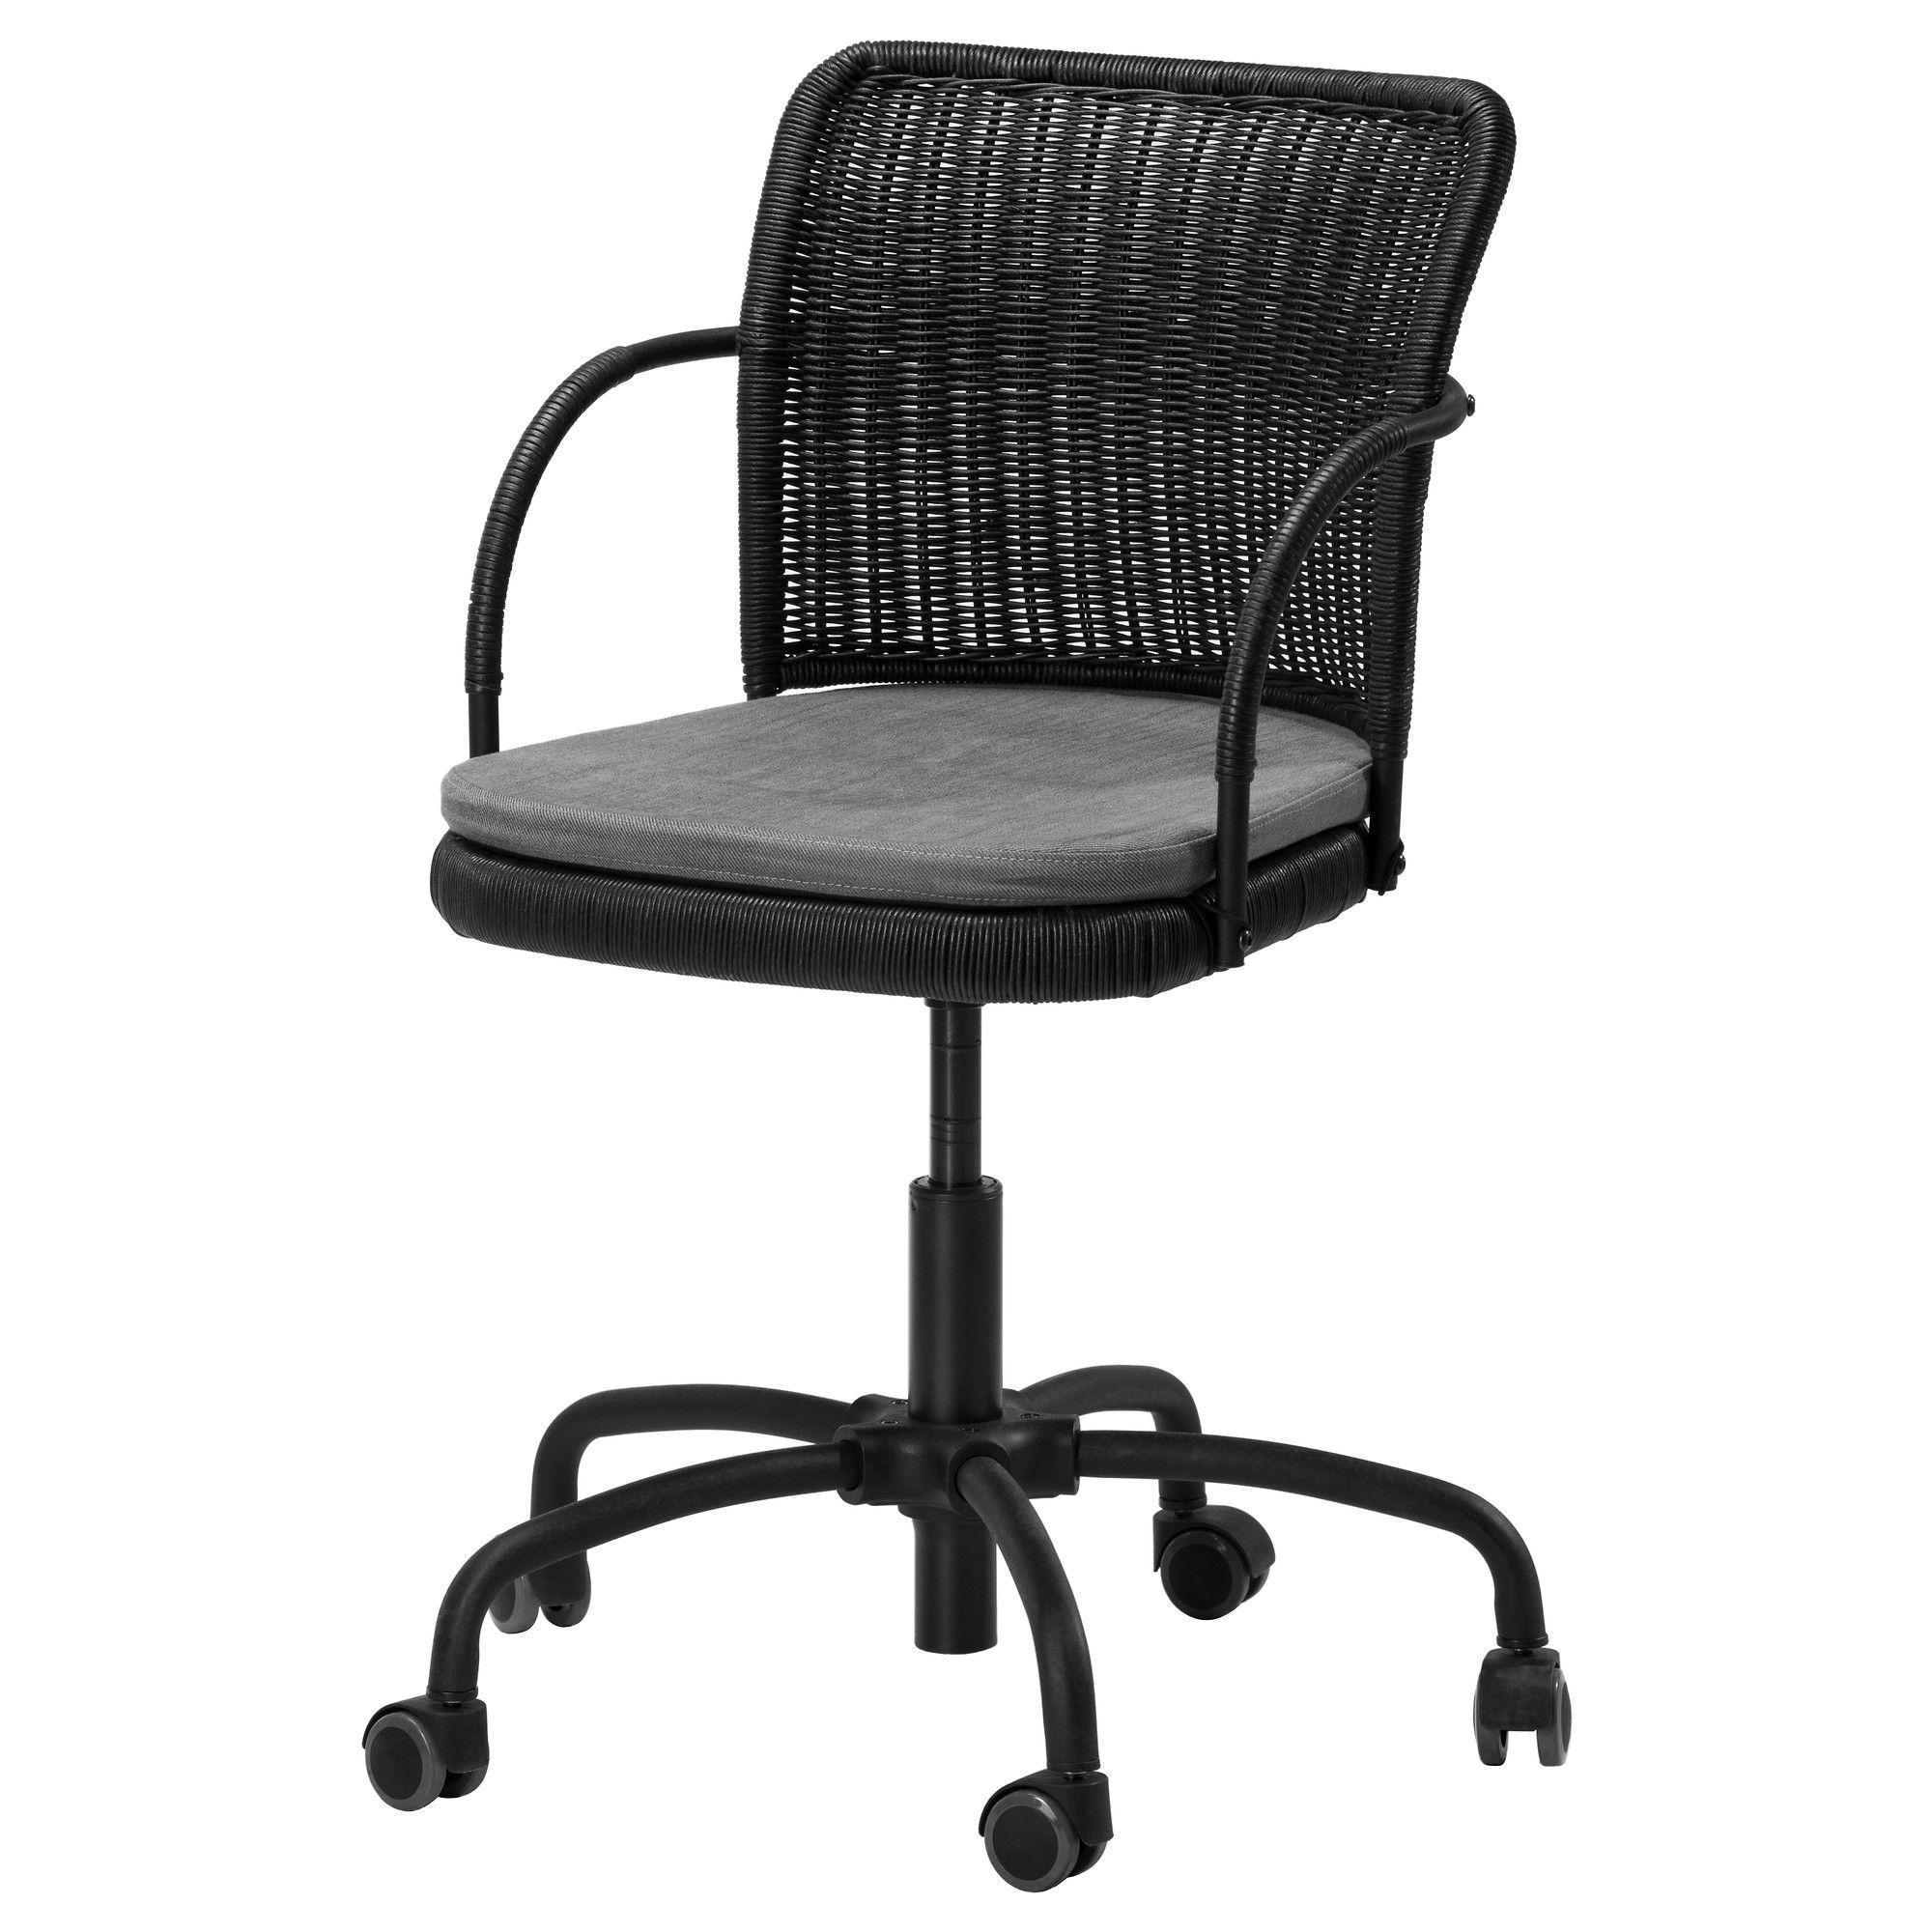 GREGOR Swivel chair black/Svanby gray IKEA 100 nail